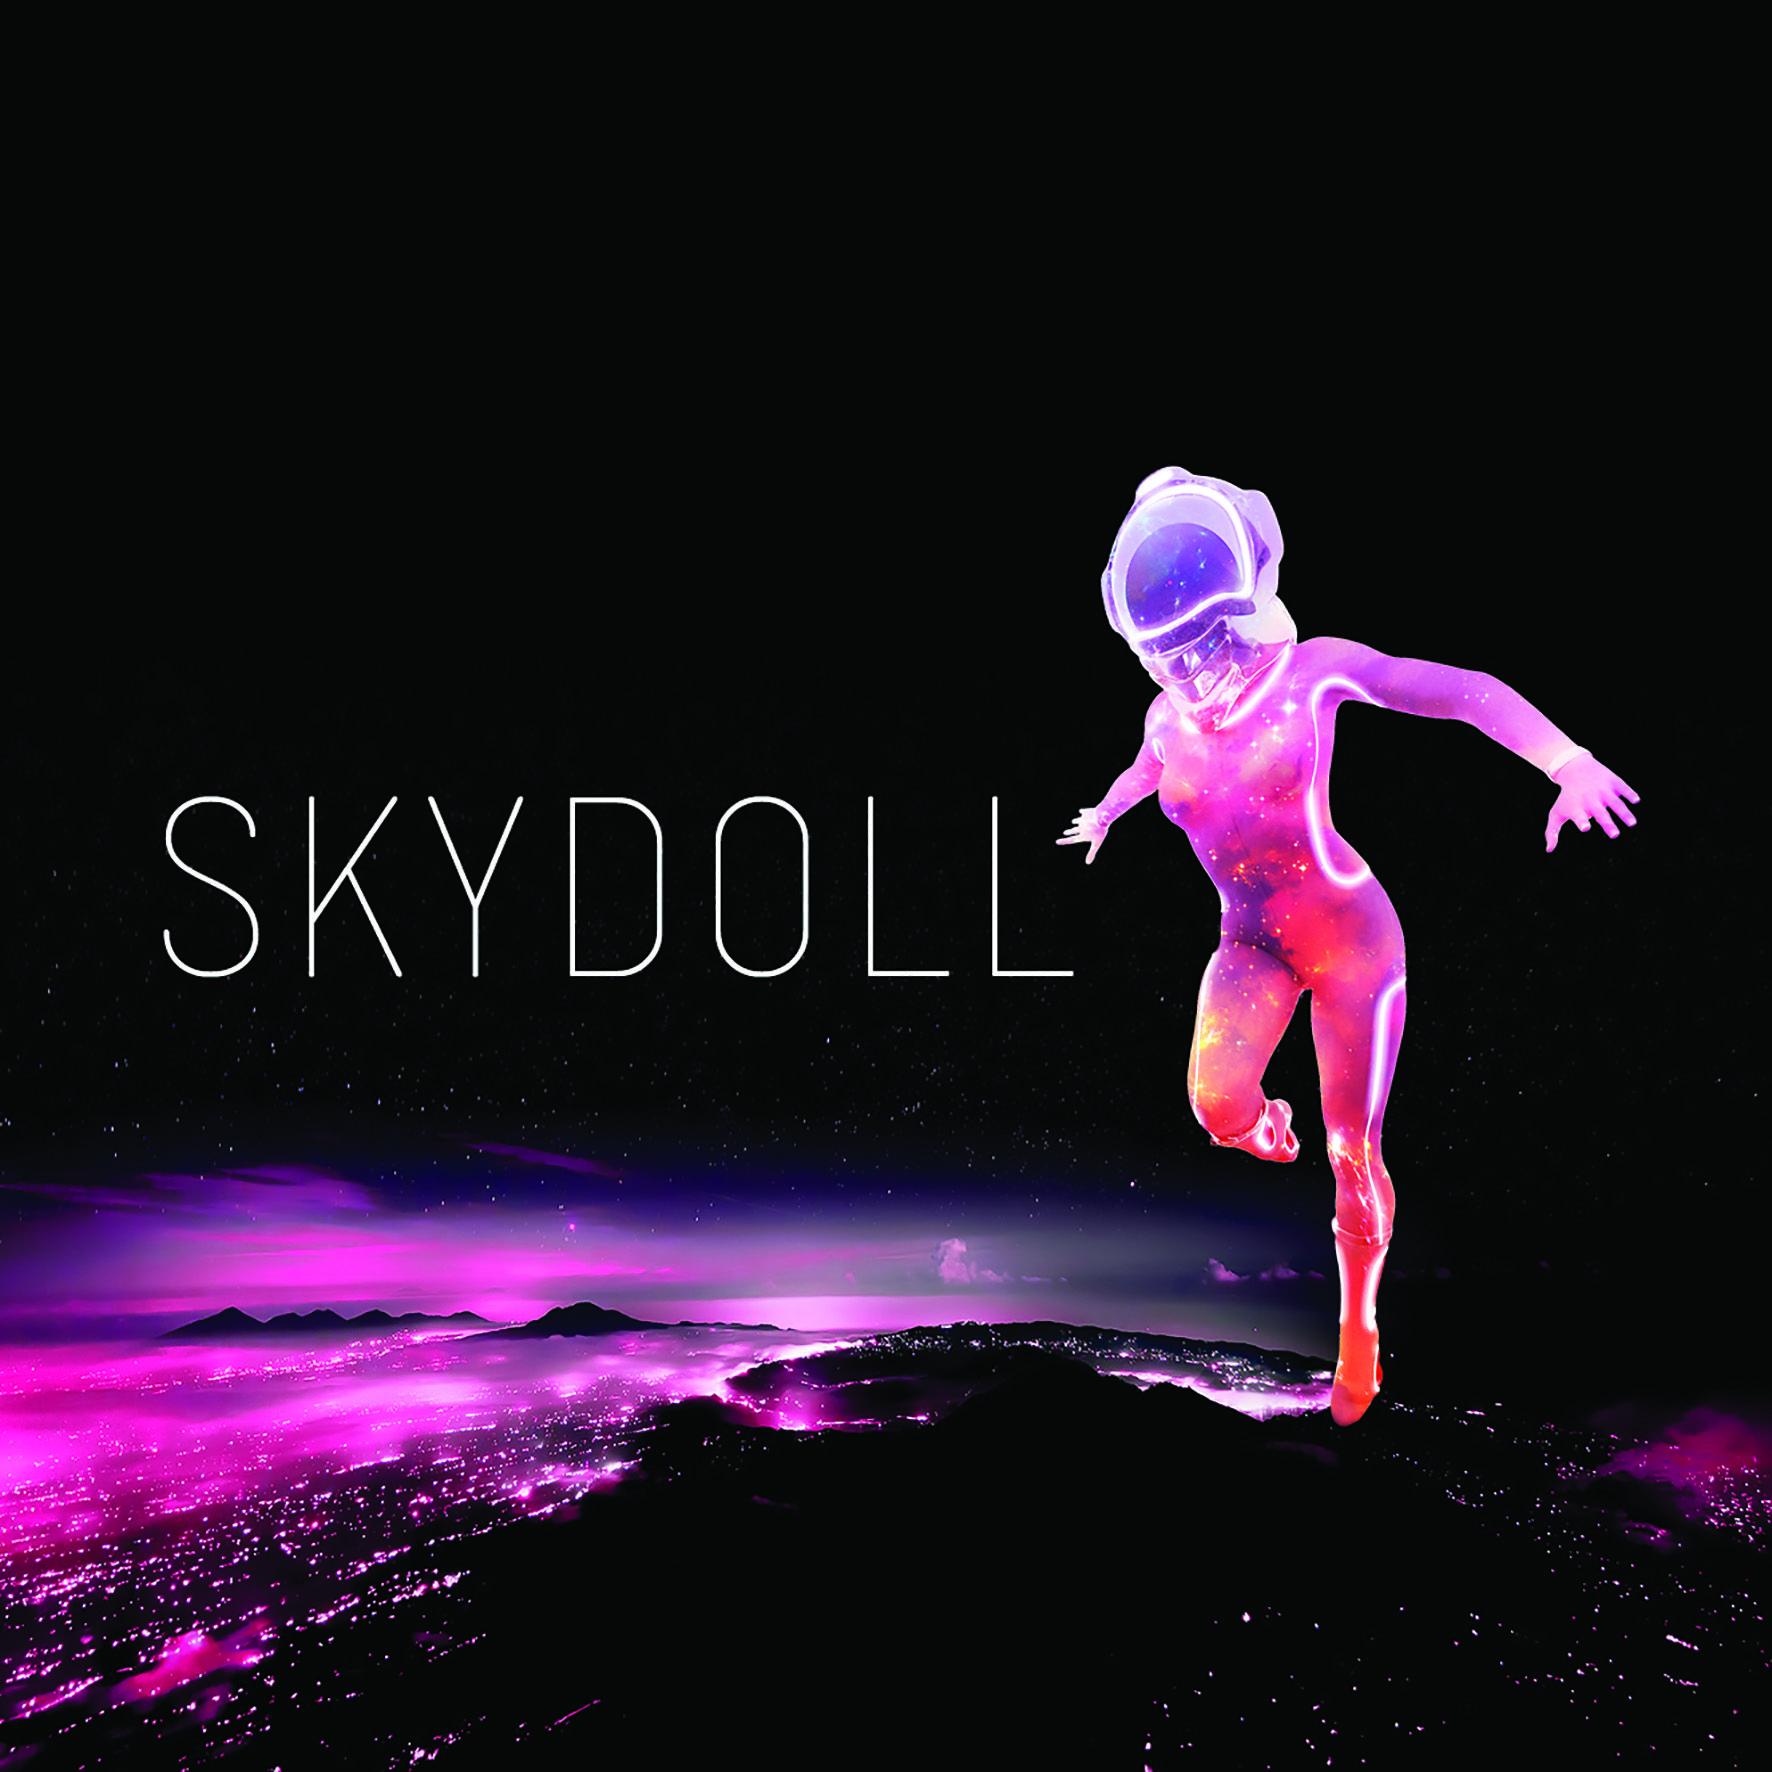 skydoll-full.jpg